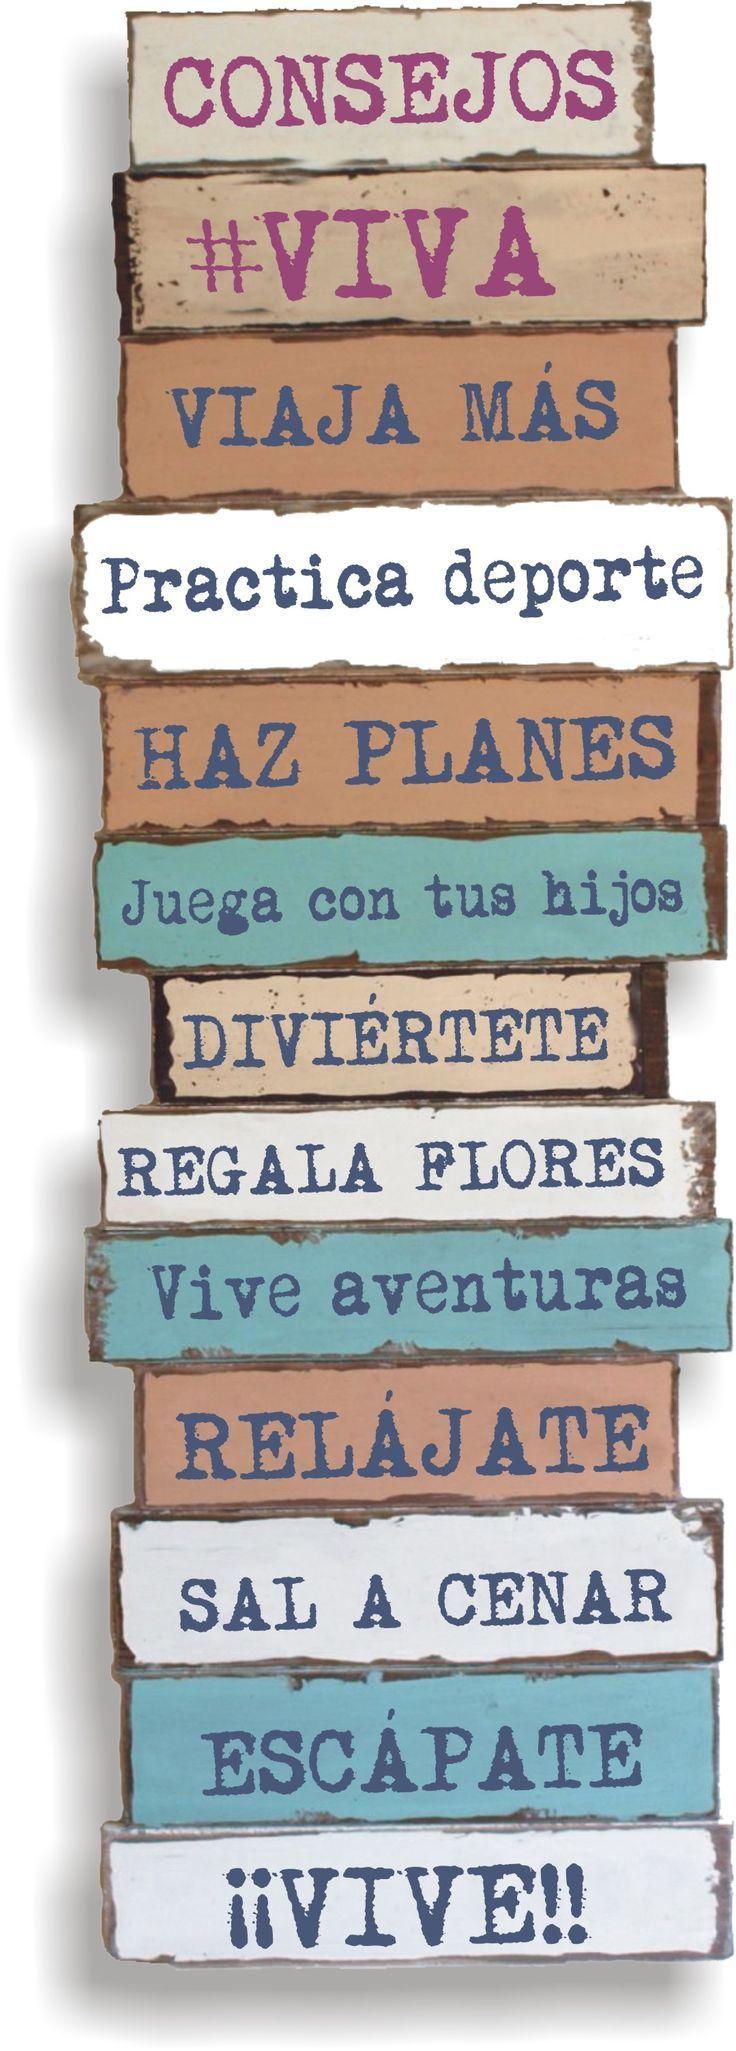 MOTIVACION - a91c7d4a180acf26f39c6a63a7755202 #RUTINA #EJERCICIO #DIETA #ADELGAZAR #FRASES #MOTIVACION #CHISTES #RISA #